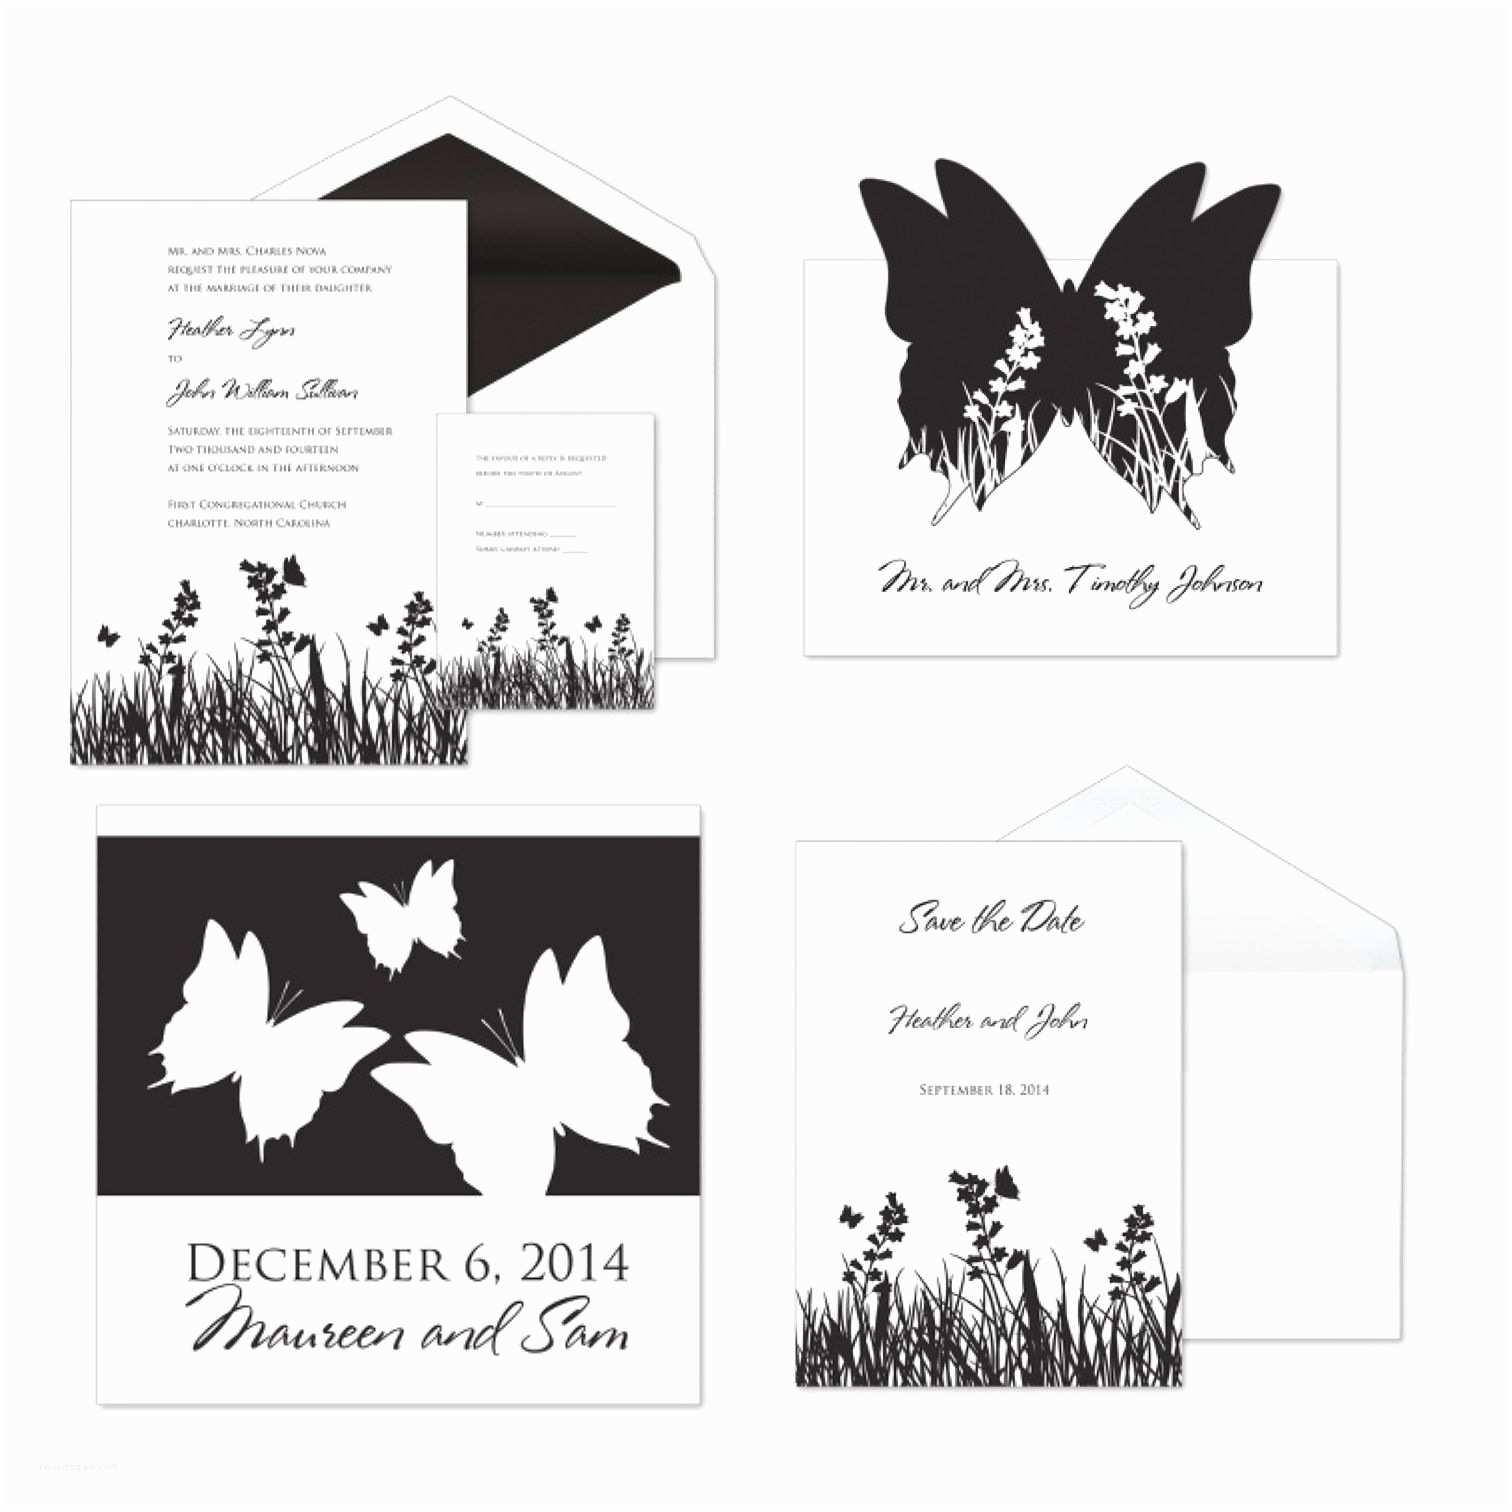 Blank Wedding Invitation Kits Pin by Iza socha On Crafts Pinterest